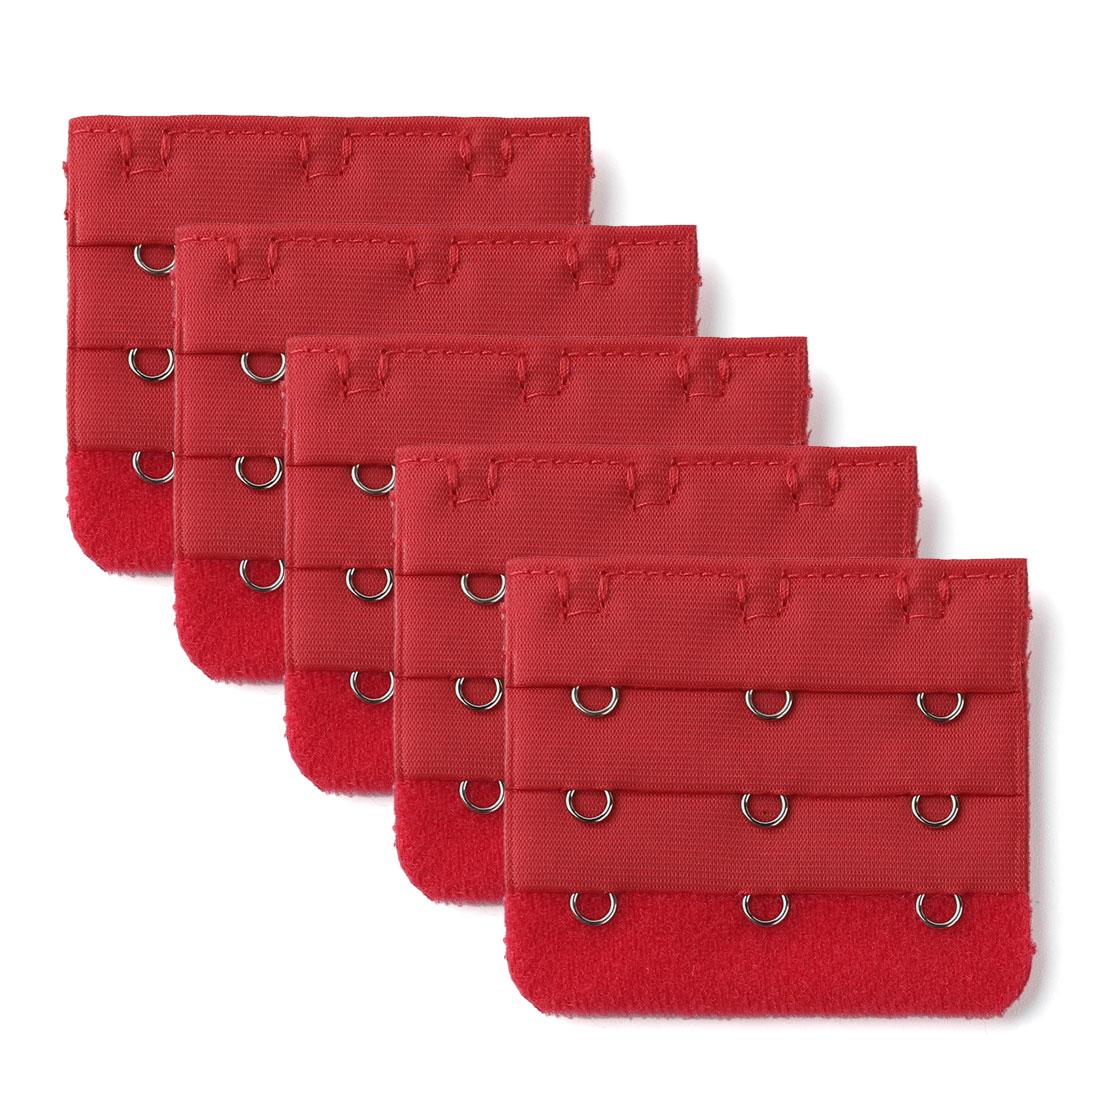 5 Pcs Red Bra 3x3 Hooks Extension Strap Extender